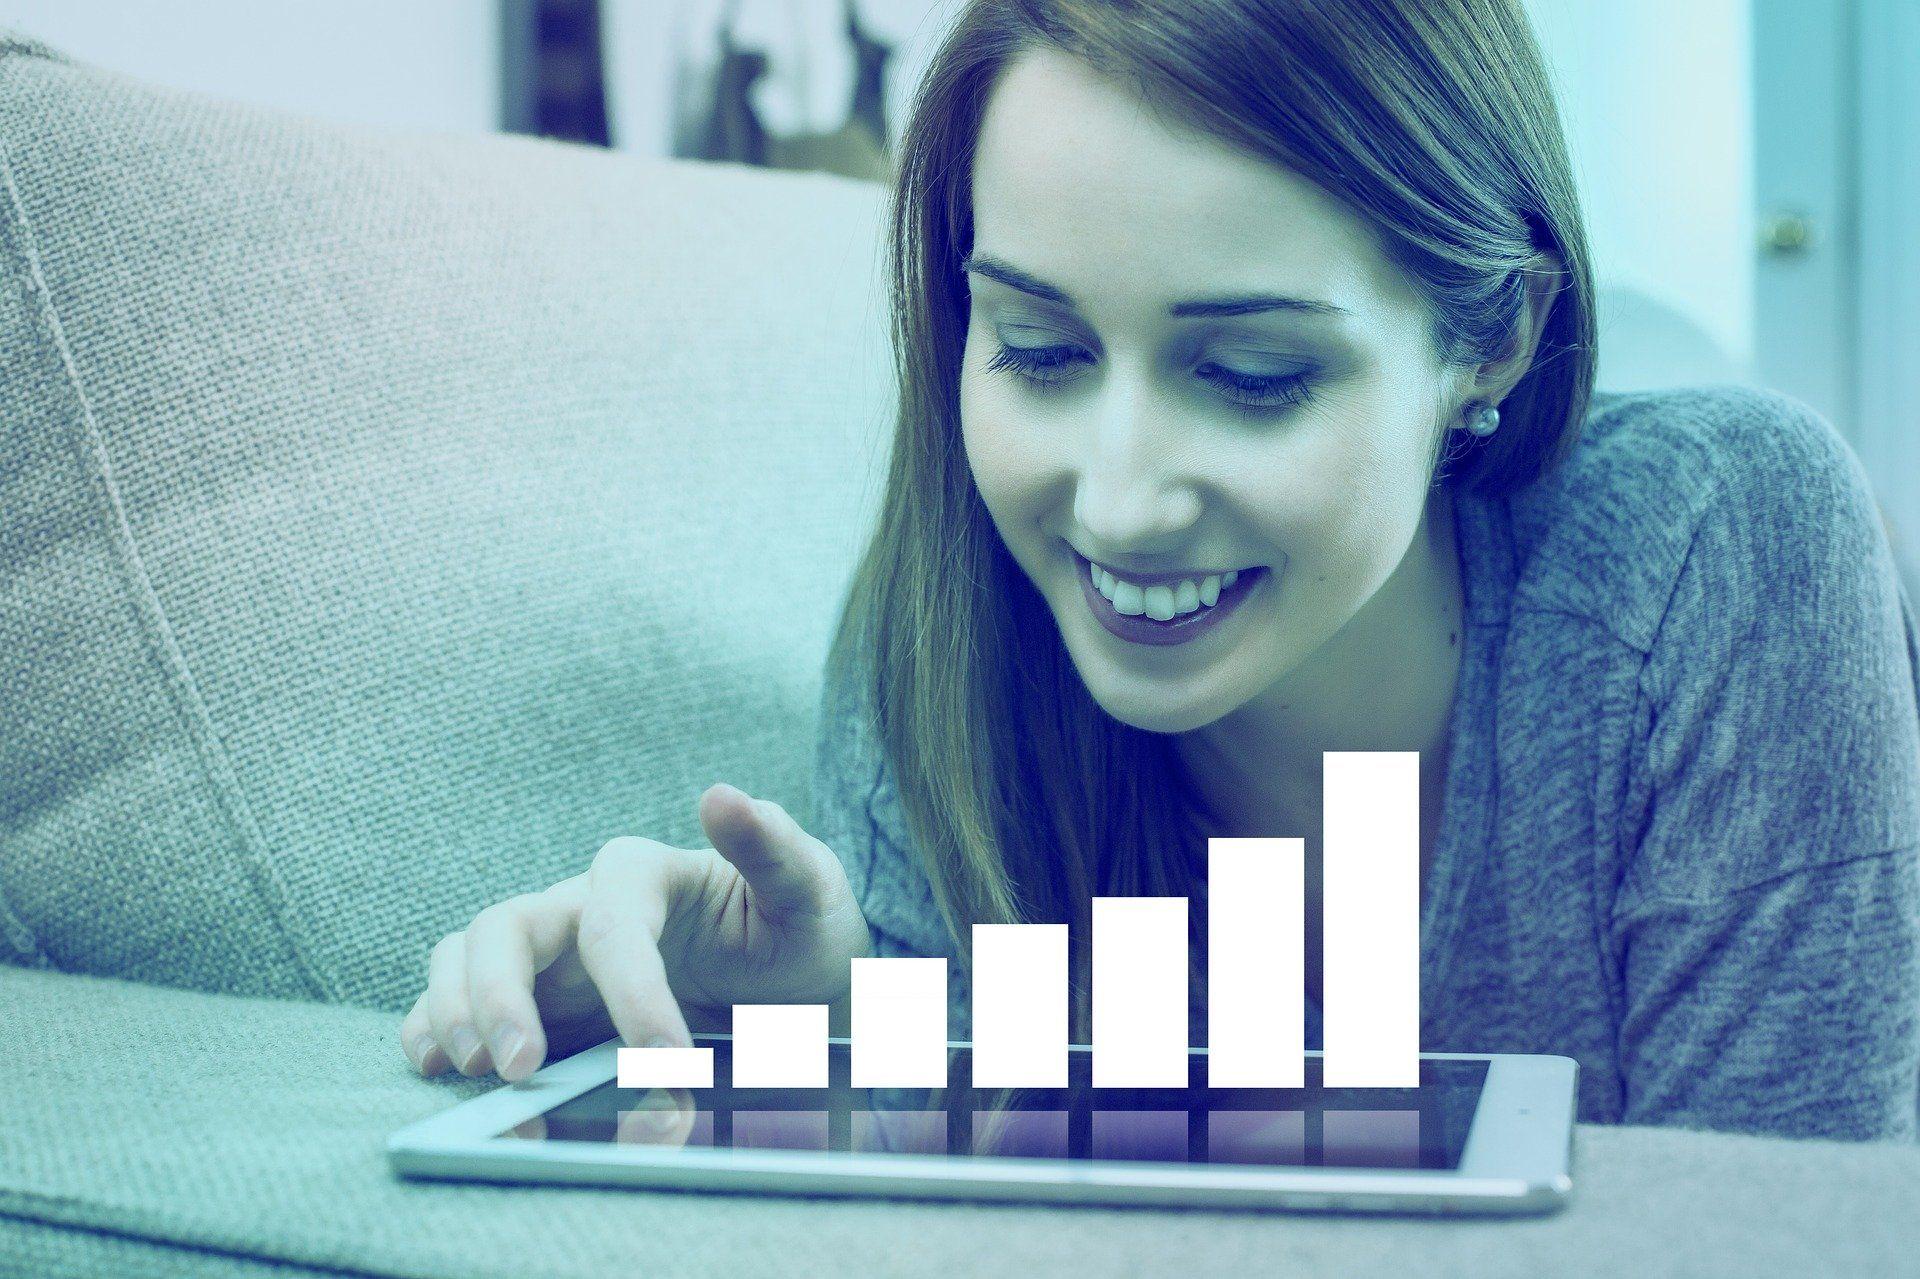 Curso SAP online: Garantía profesional en la era digital según Elearning Digital